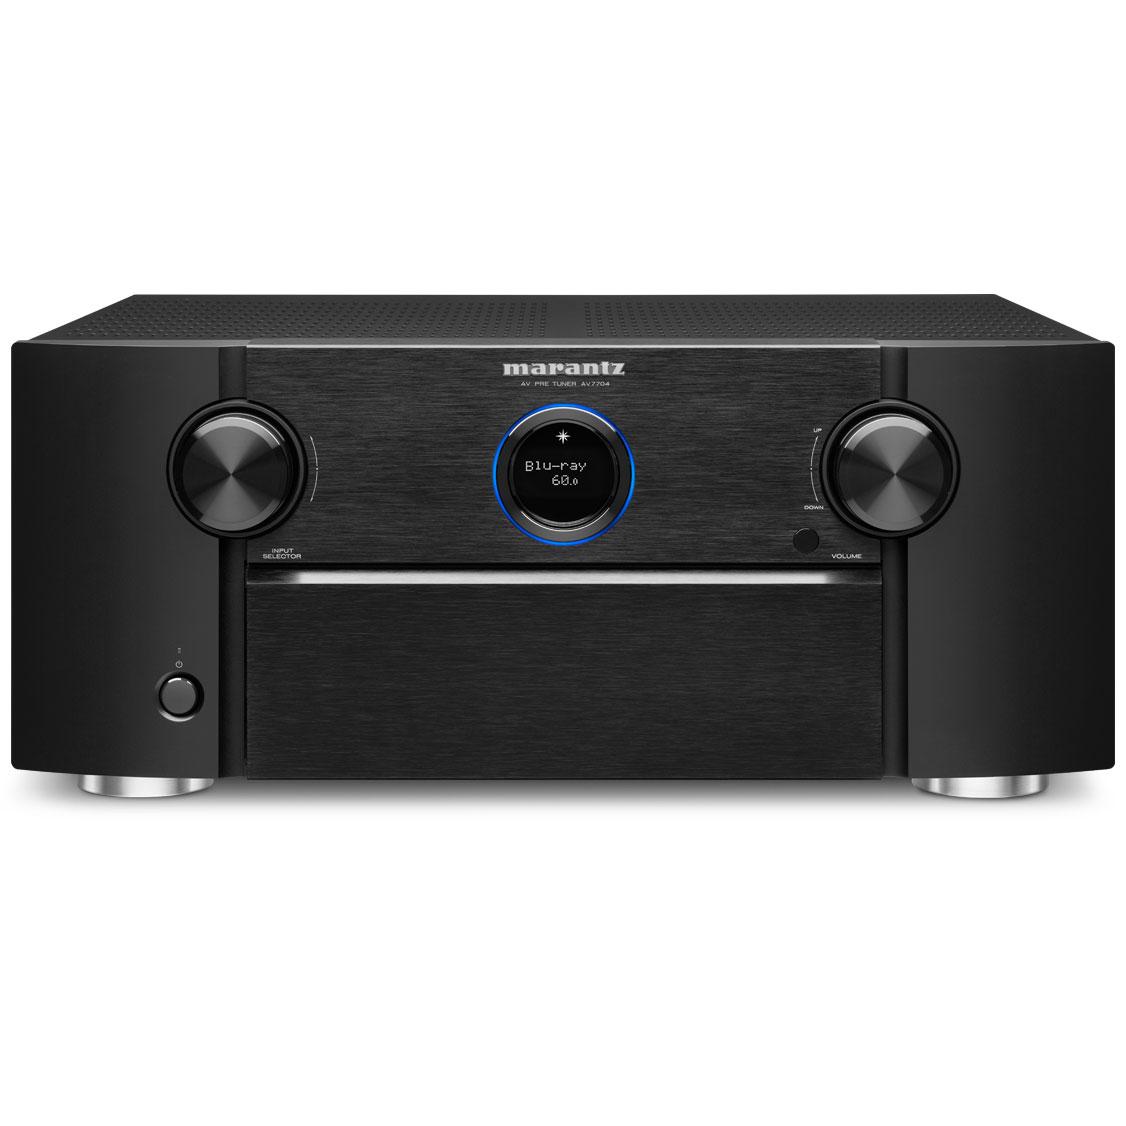 Ampli home cinéma Marantz AV7704 Noir Préampli-tuner Home Cinema 3D 11.2 Ultra HD/4K, Wi-Fi, AirPlay, Bluetooth, HDCP 2.2, Dolby Atmos et DTS:X